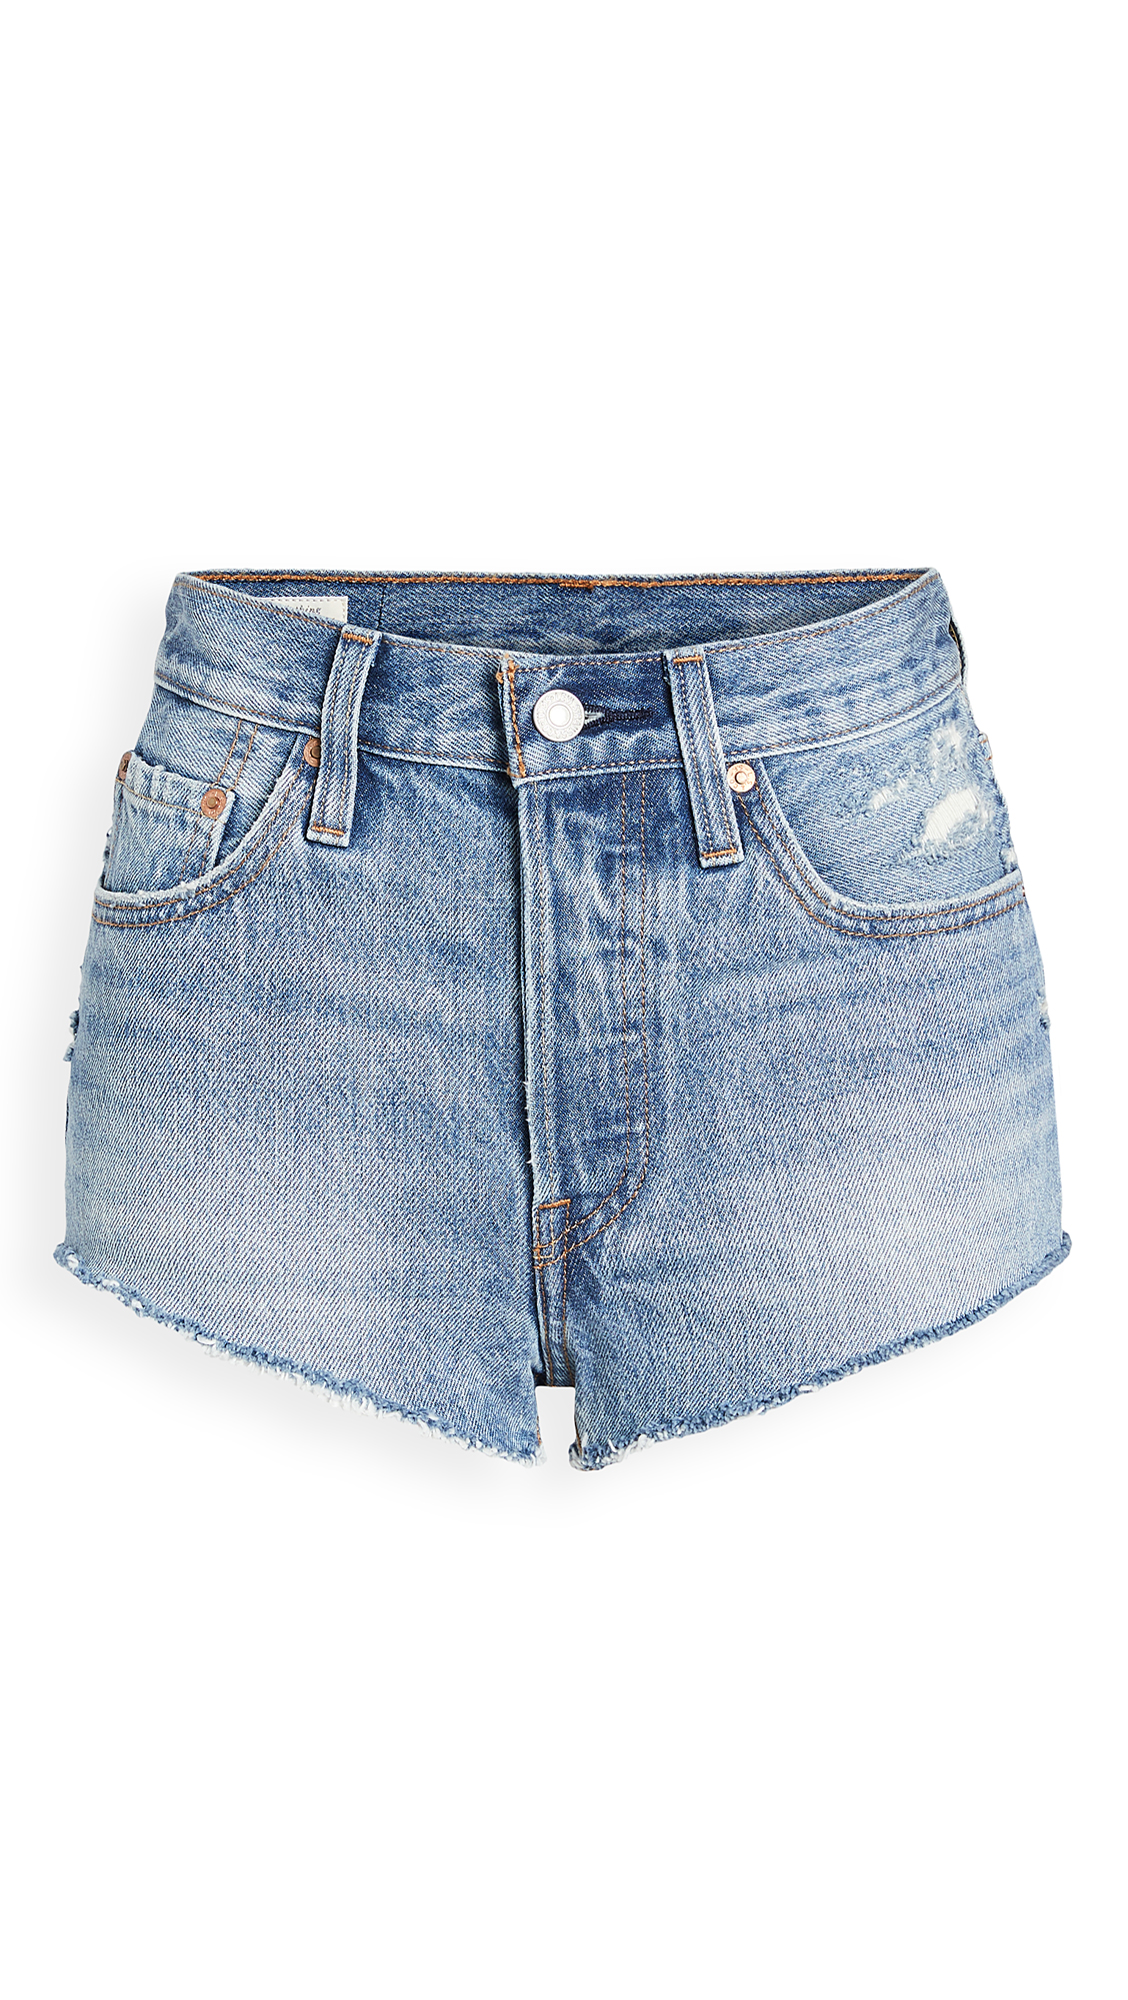 Levis 501 Tiny Shorts - Mini